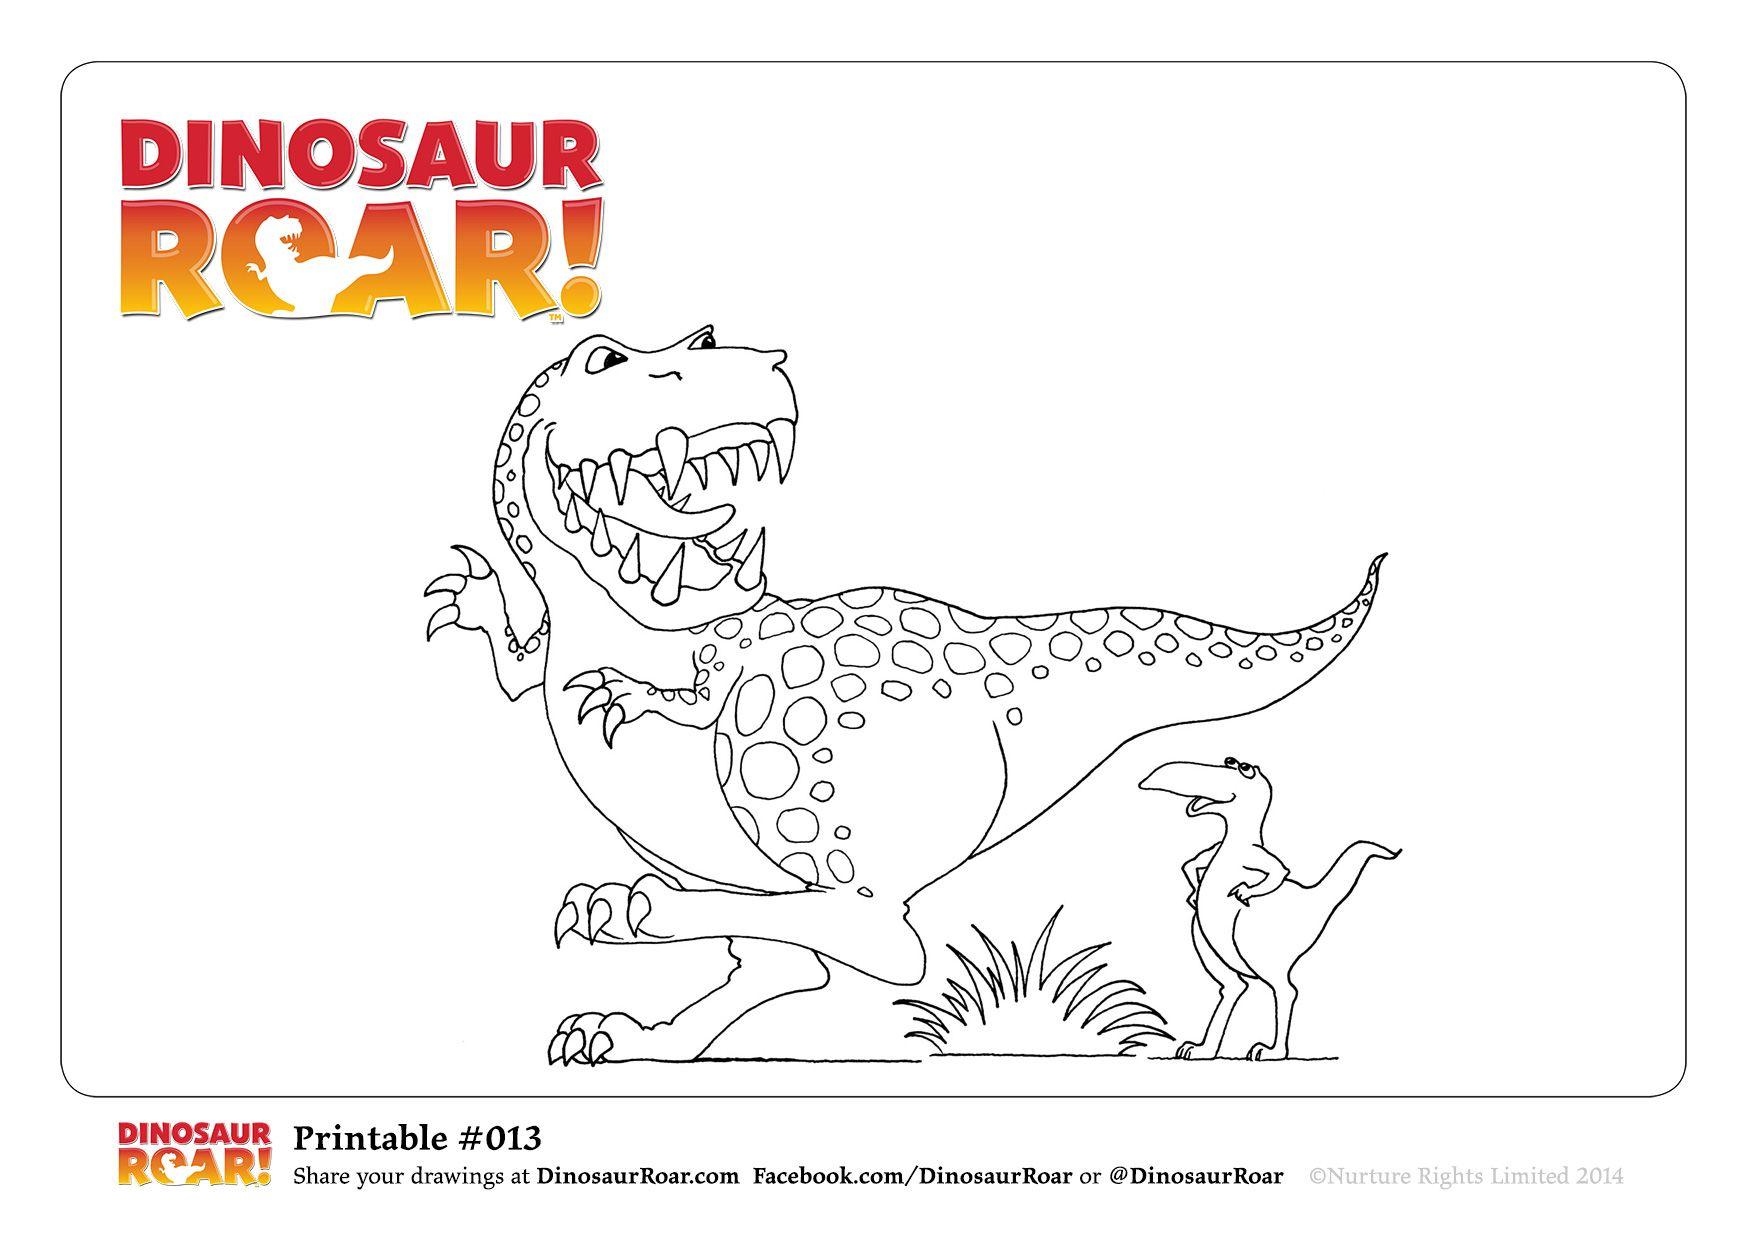 DinosaurRoar coloring pages - Dinosaur Roar Cover - Dinosaur Roar ...